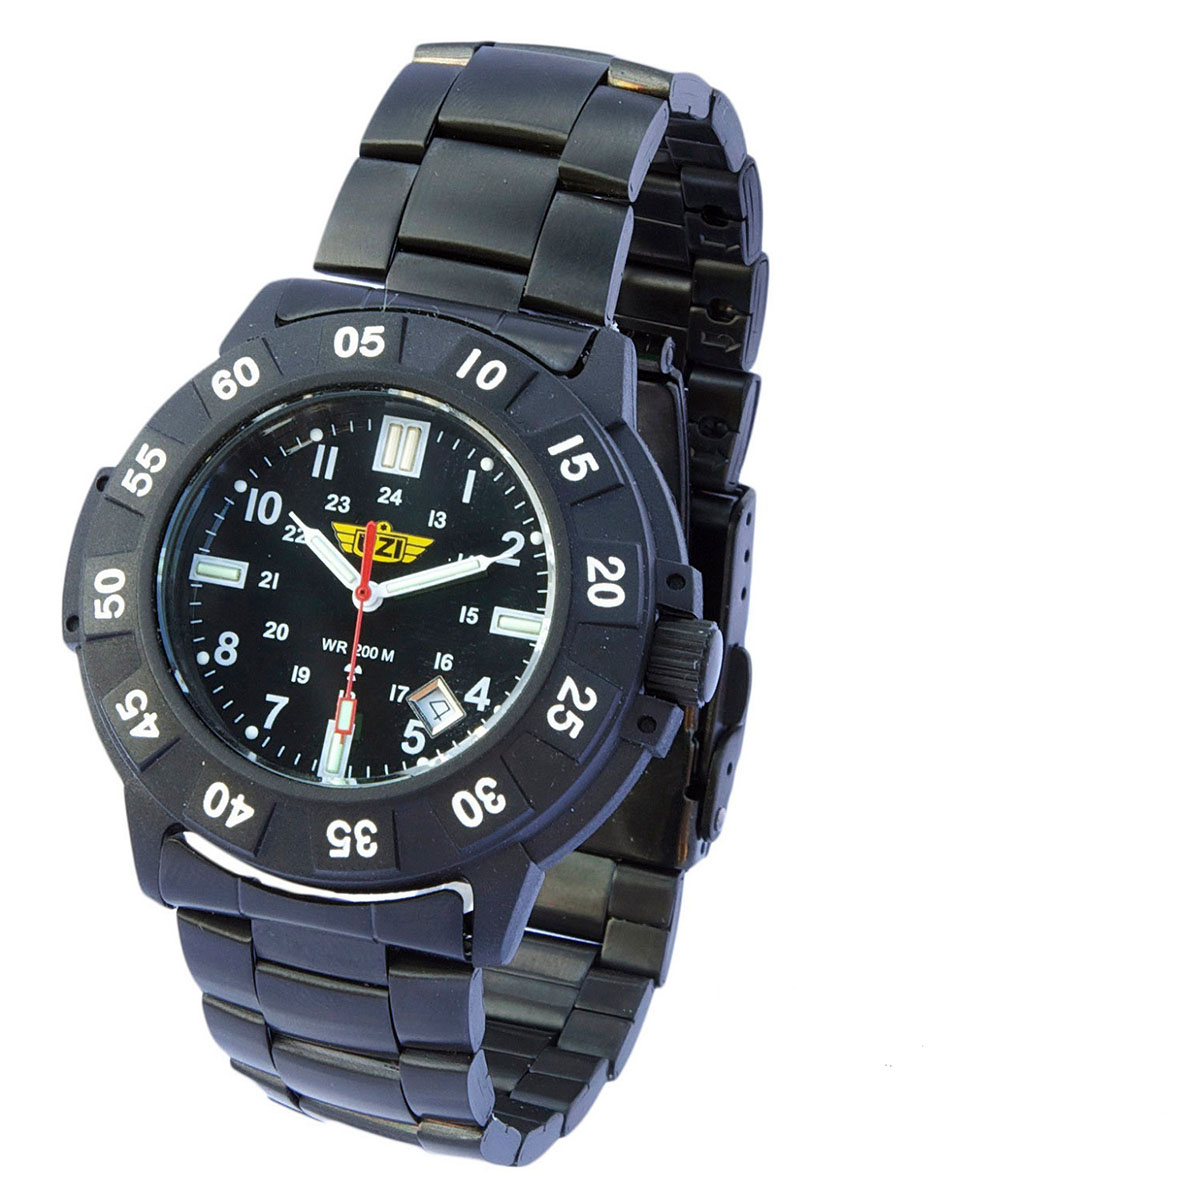 UZI Protector Tritium H3 Watch with Metal Strap - Black -...